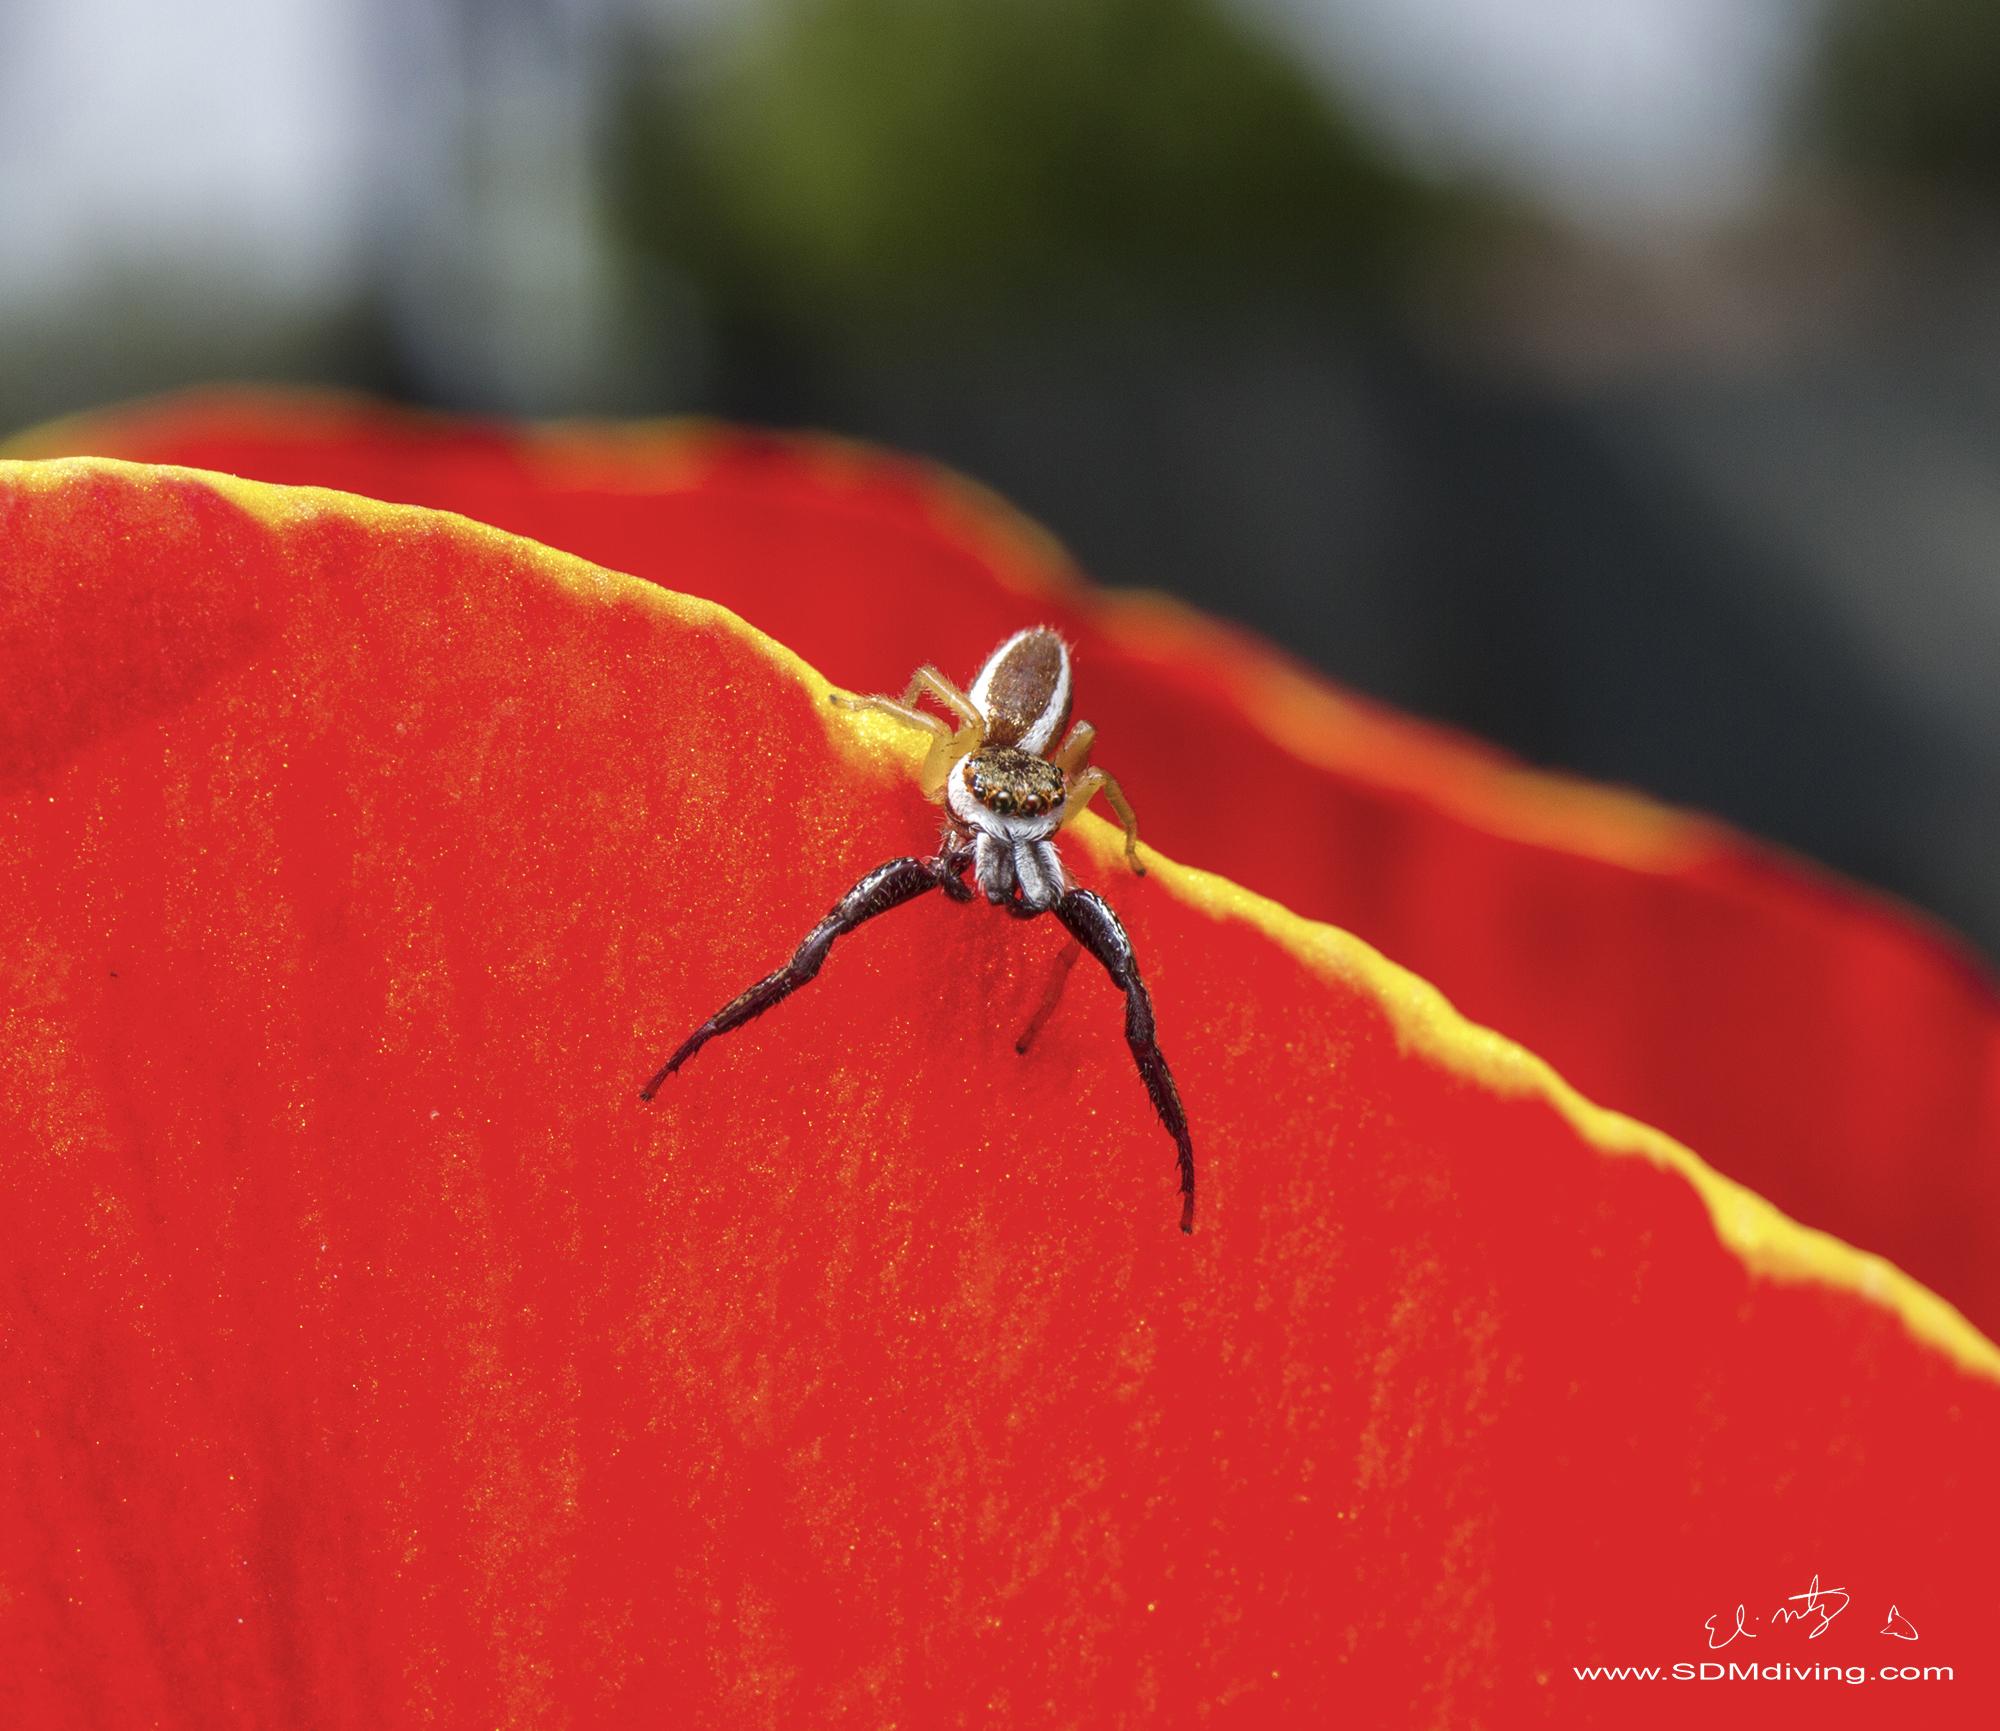 9. Jumping Spider